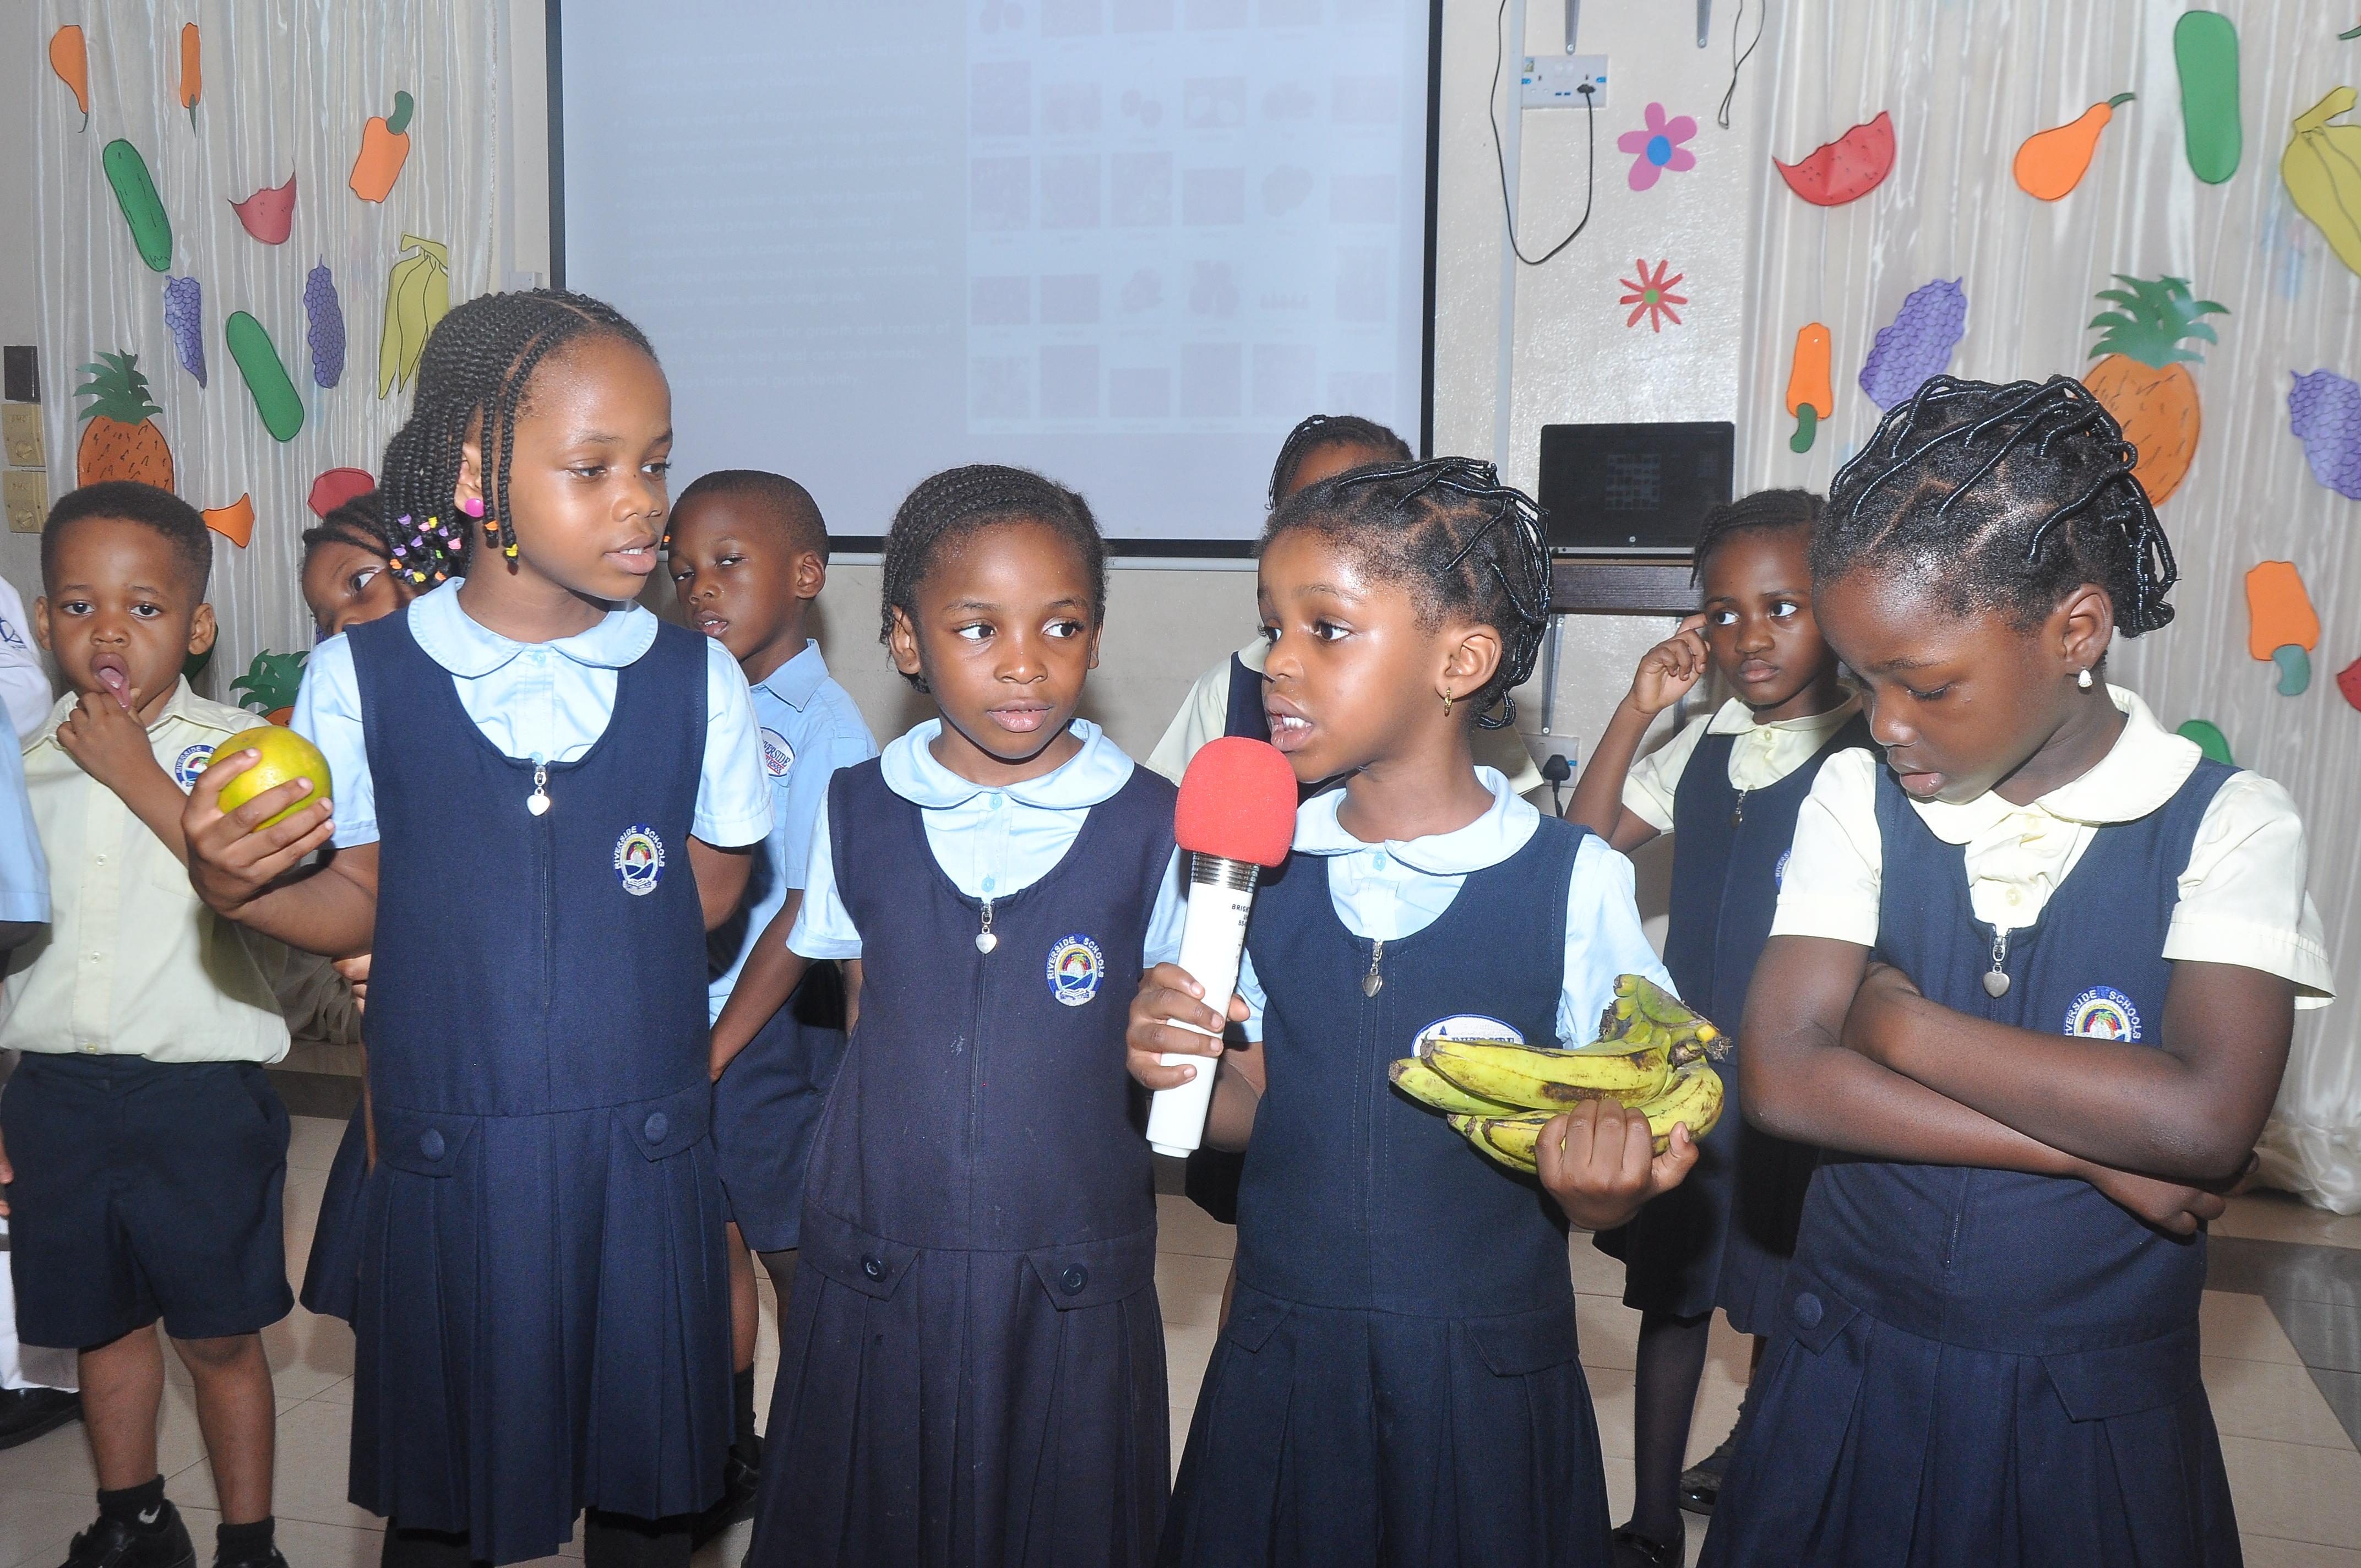 fruits_health_nursery_school_theme_presentations_riverside_montessori (3)